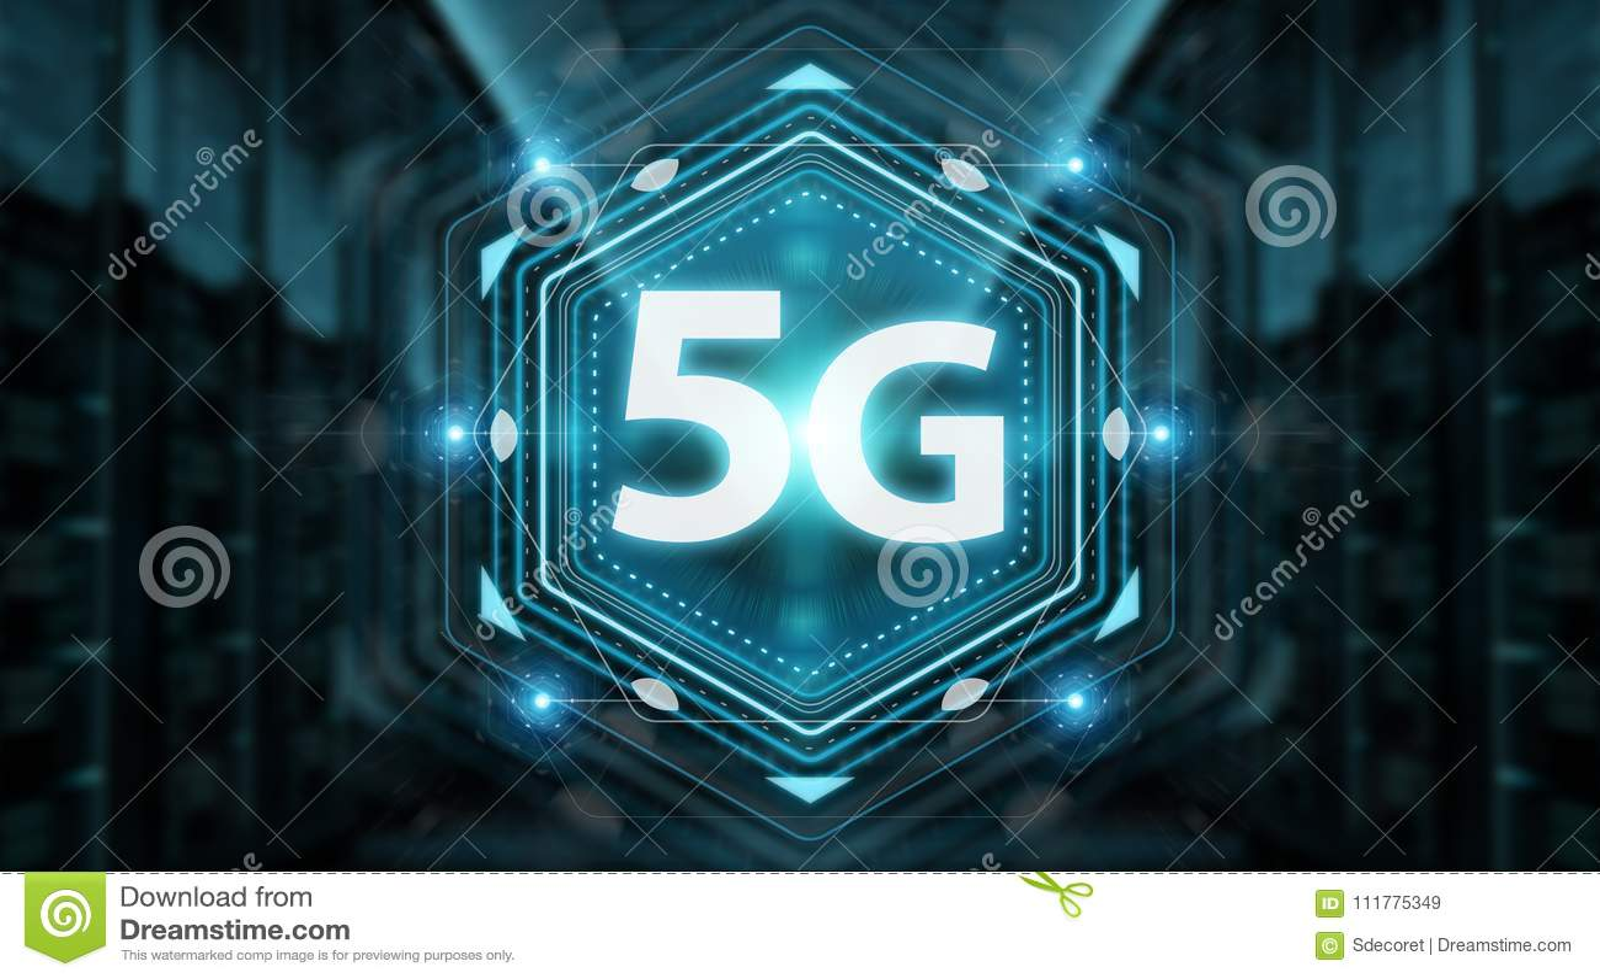 5G network interface 3D rendering